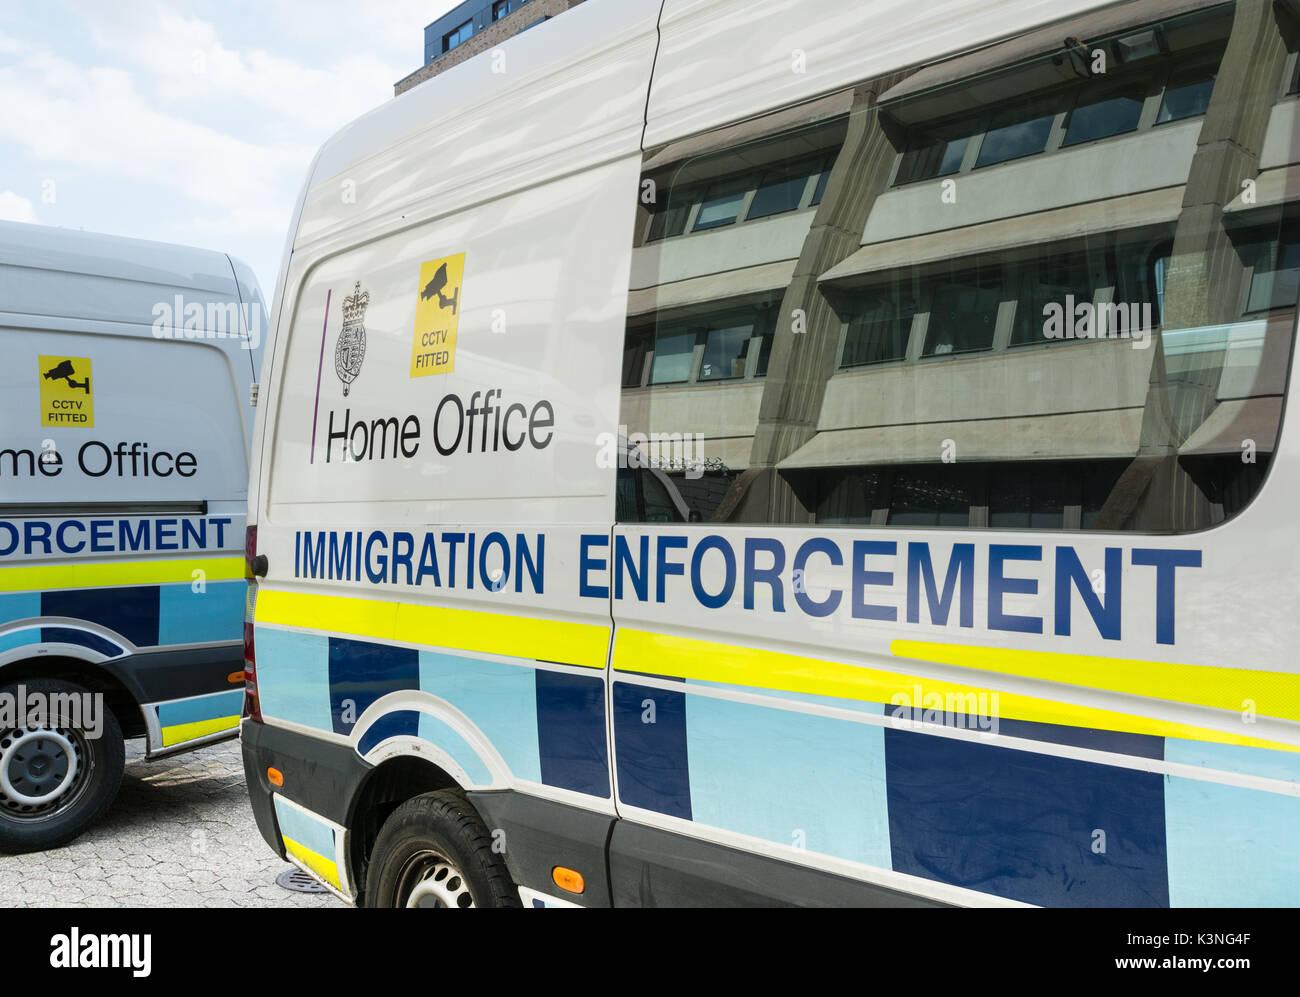 Home Office Immigration enforcement vans in Southwark, London, SE1, UK Stock Photo